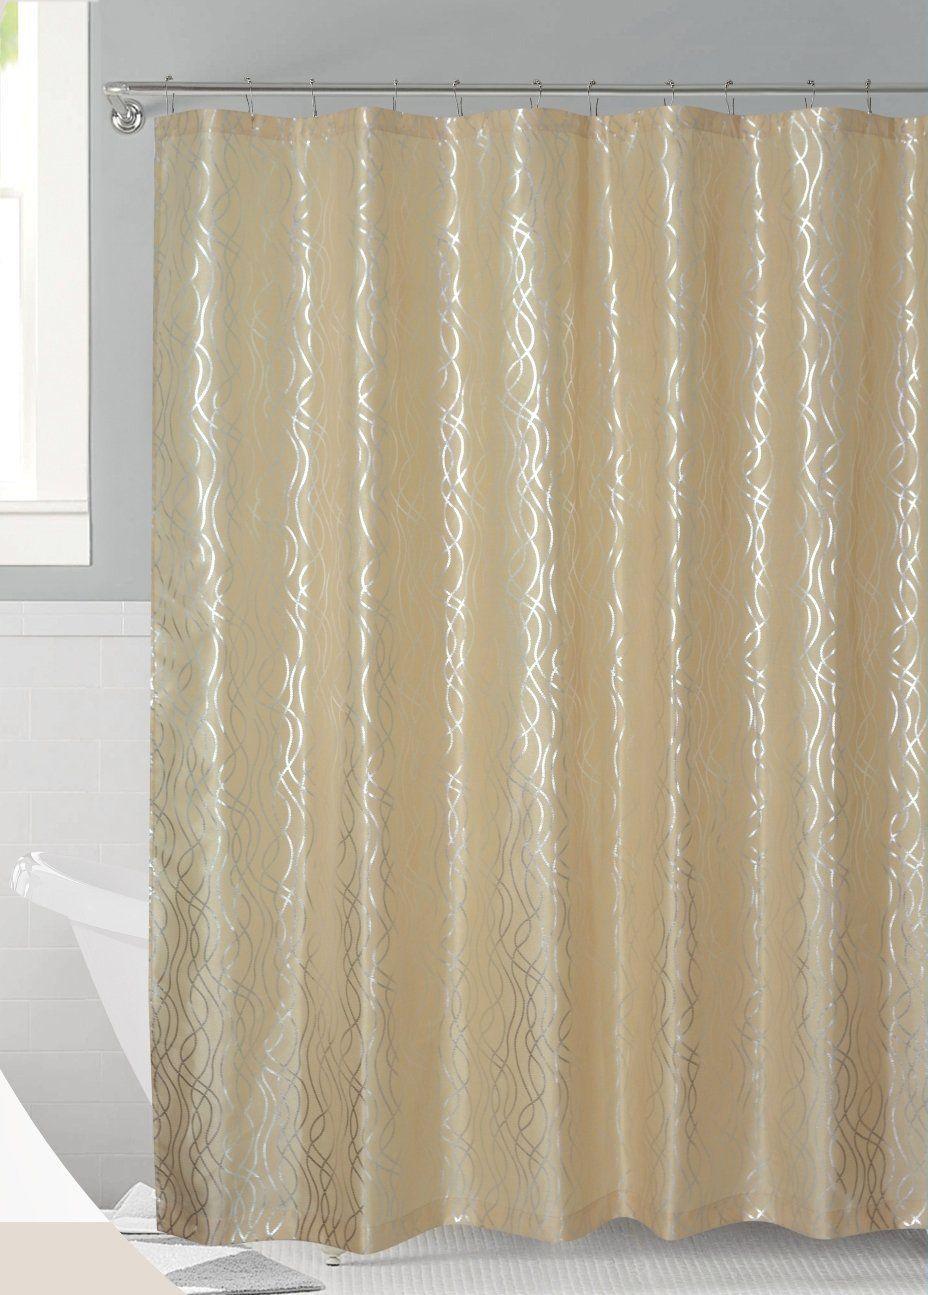 Amazon Luxurious Metalic Moroccan Trellis Shower Curtain Set With 12 Hooks 72